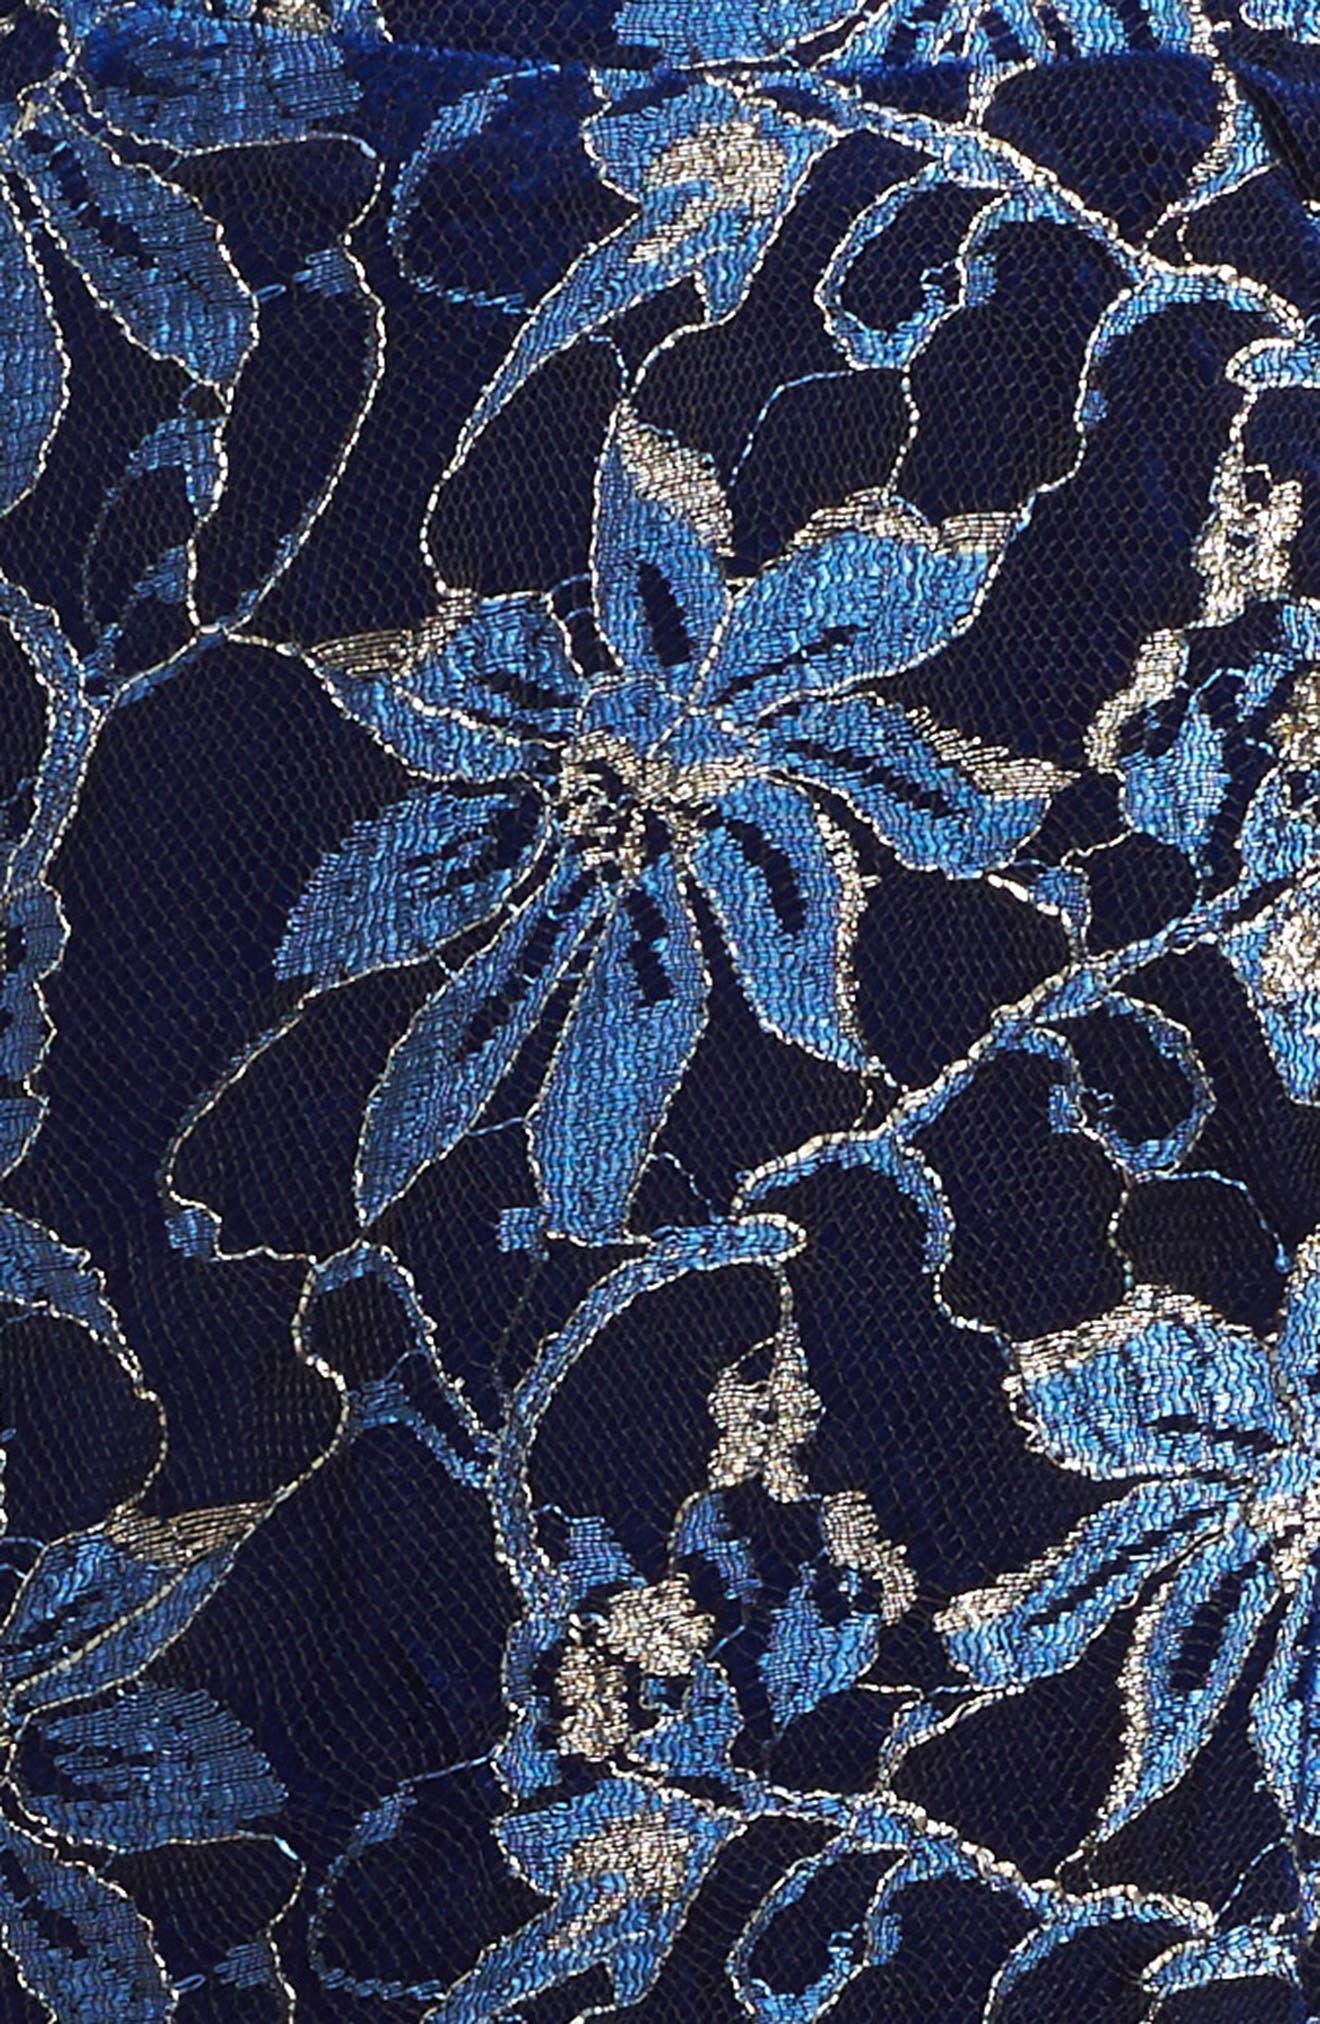 Heather Floral Mesh Dress,                             Alternate thumbnail 3, color,                             Royal Blue